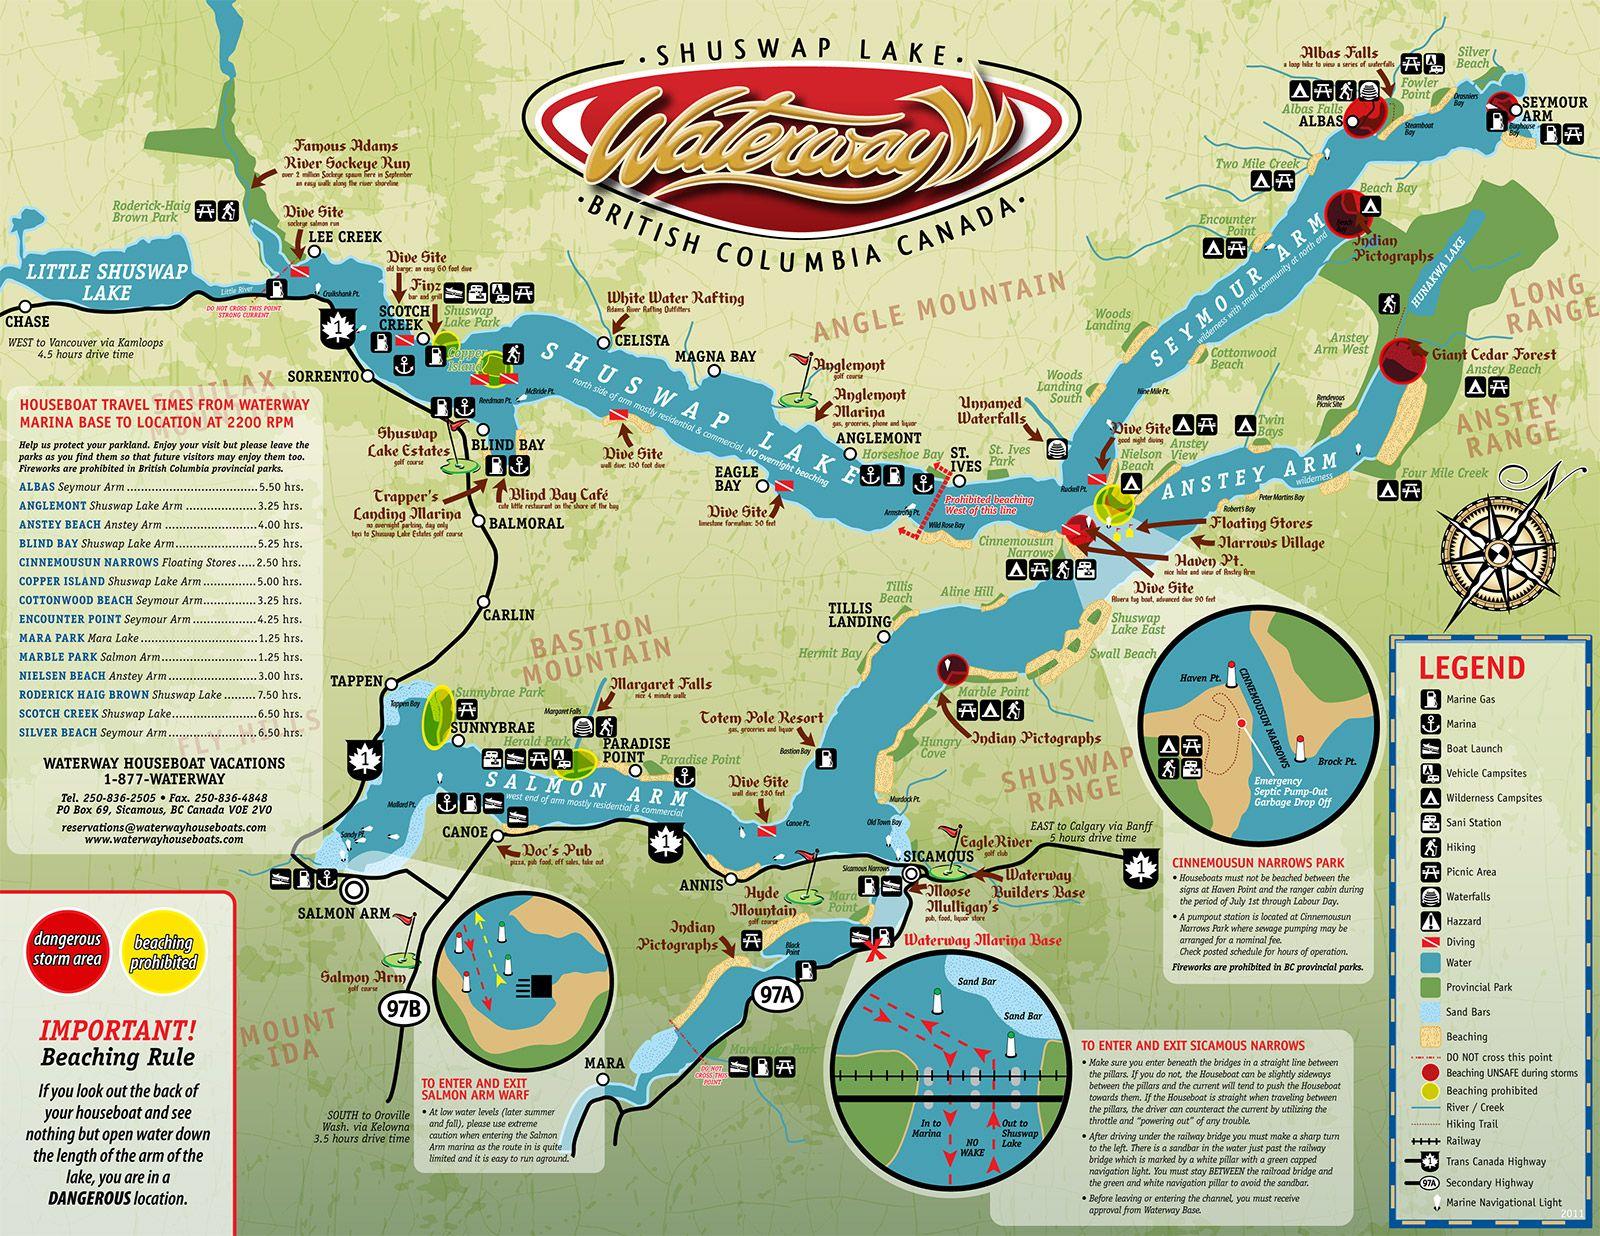 Map Of Shuswap Lake B C Canada Pin by Alexis Kuzmick on Canadian Rockies Trip | Lake map, House